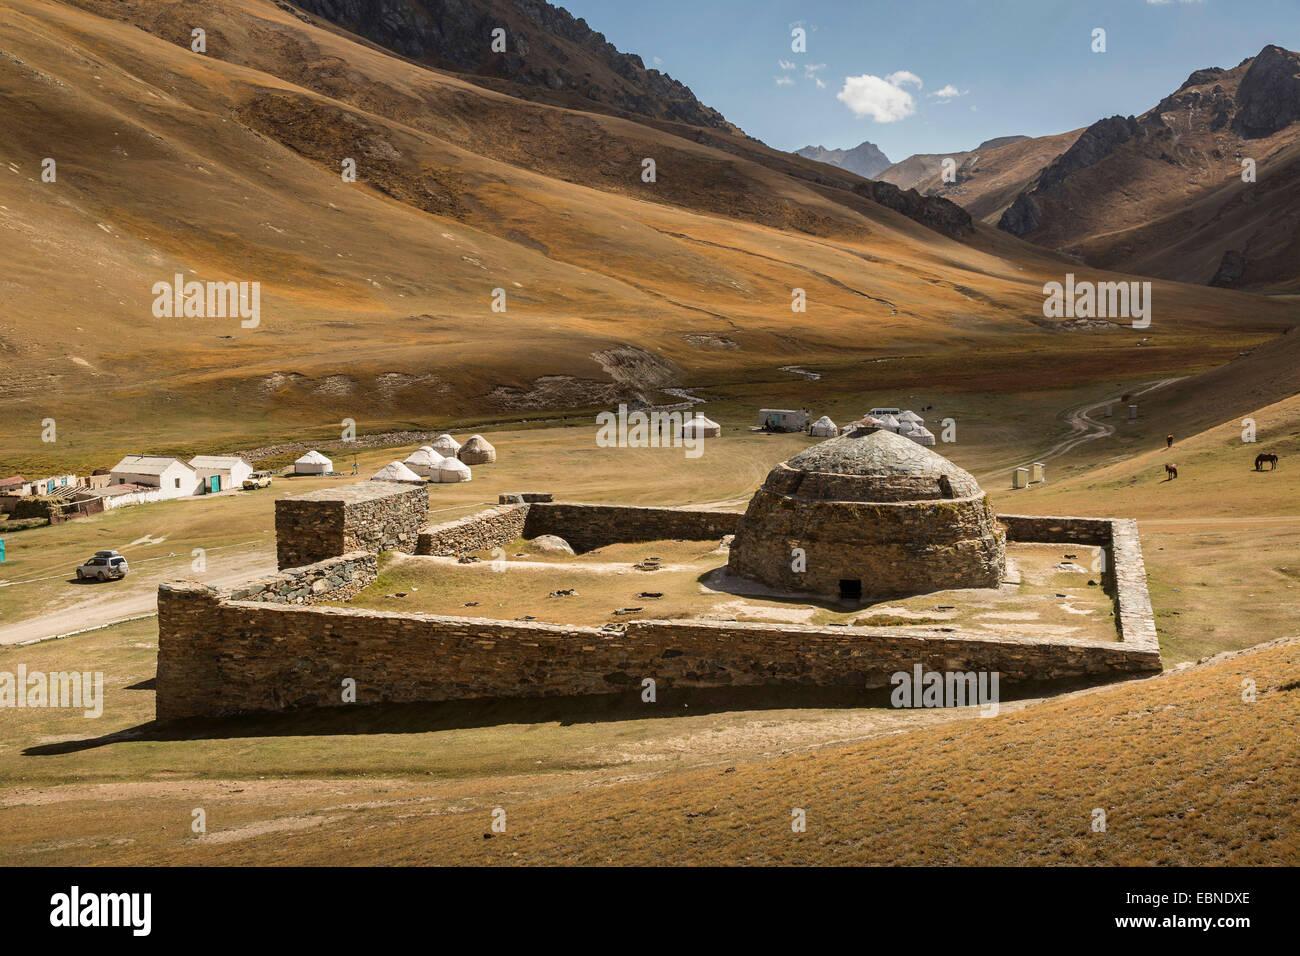 Excellent TashRabat Caravanserai Kyrgyzstan Tours In Kyrgyzstan Travel To